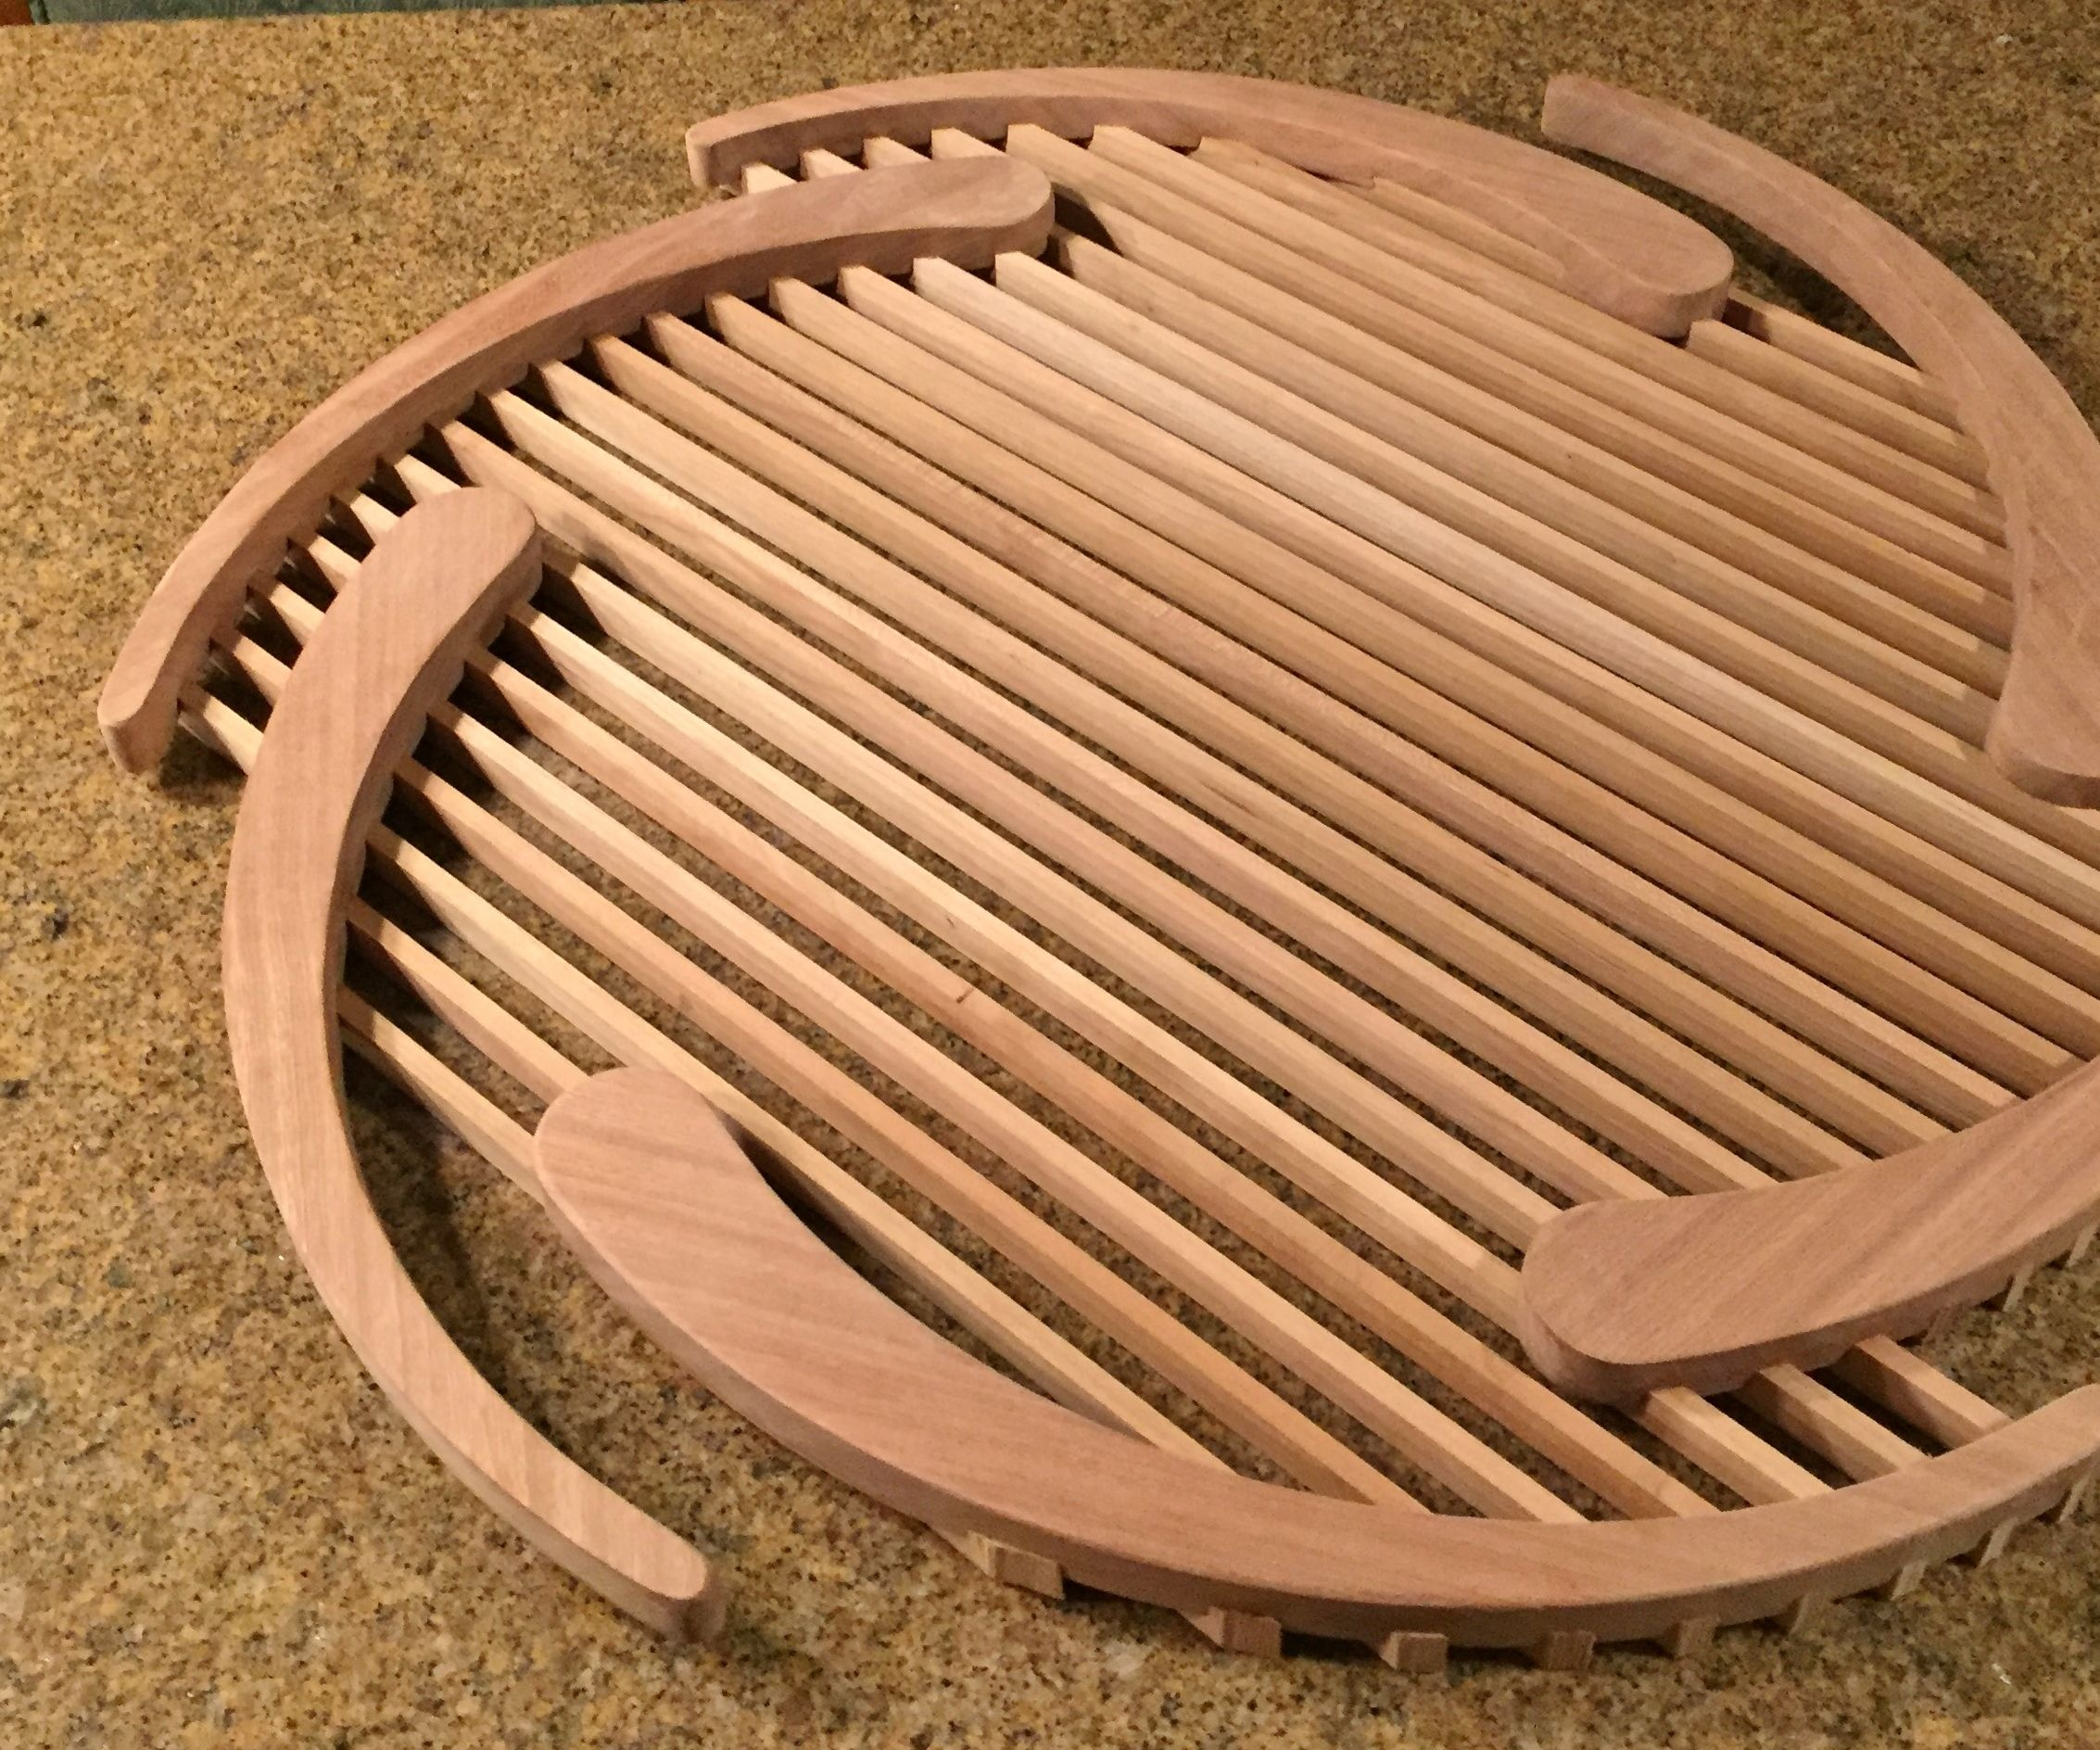 Hardwood Serving Trays/Cooling Racks/Objects D'Arte